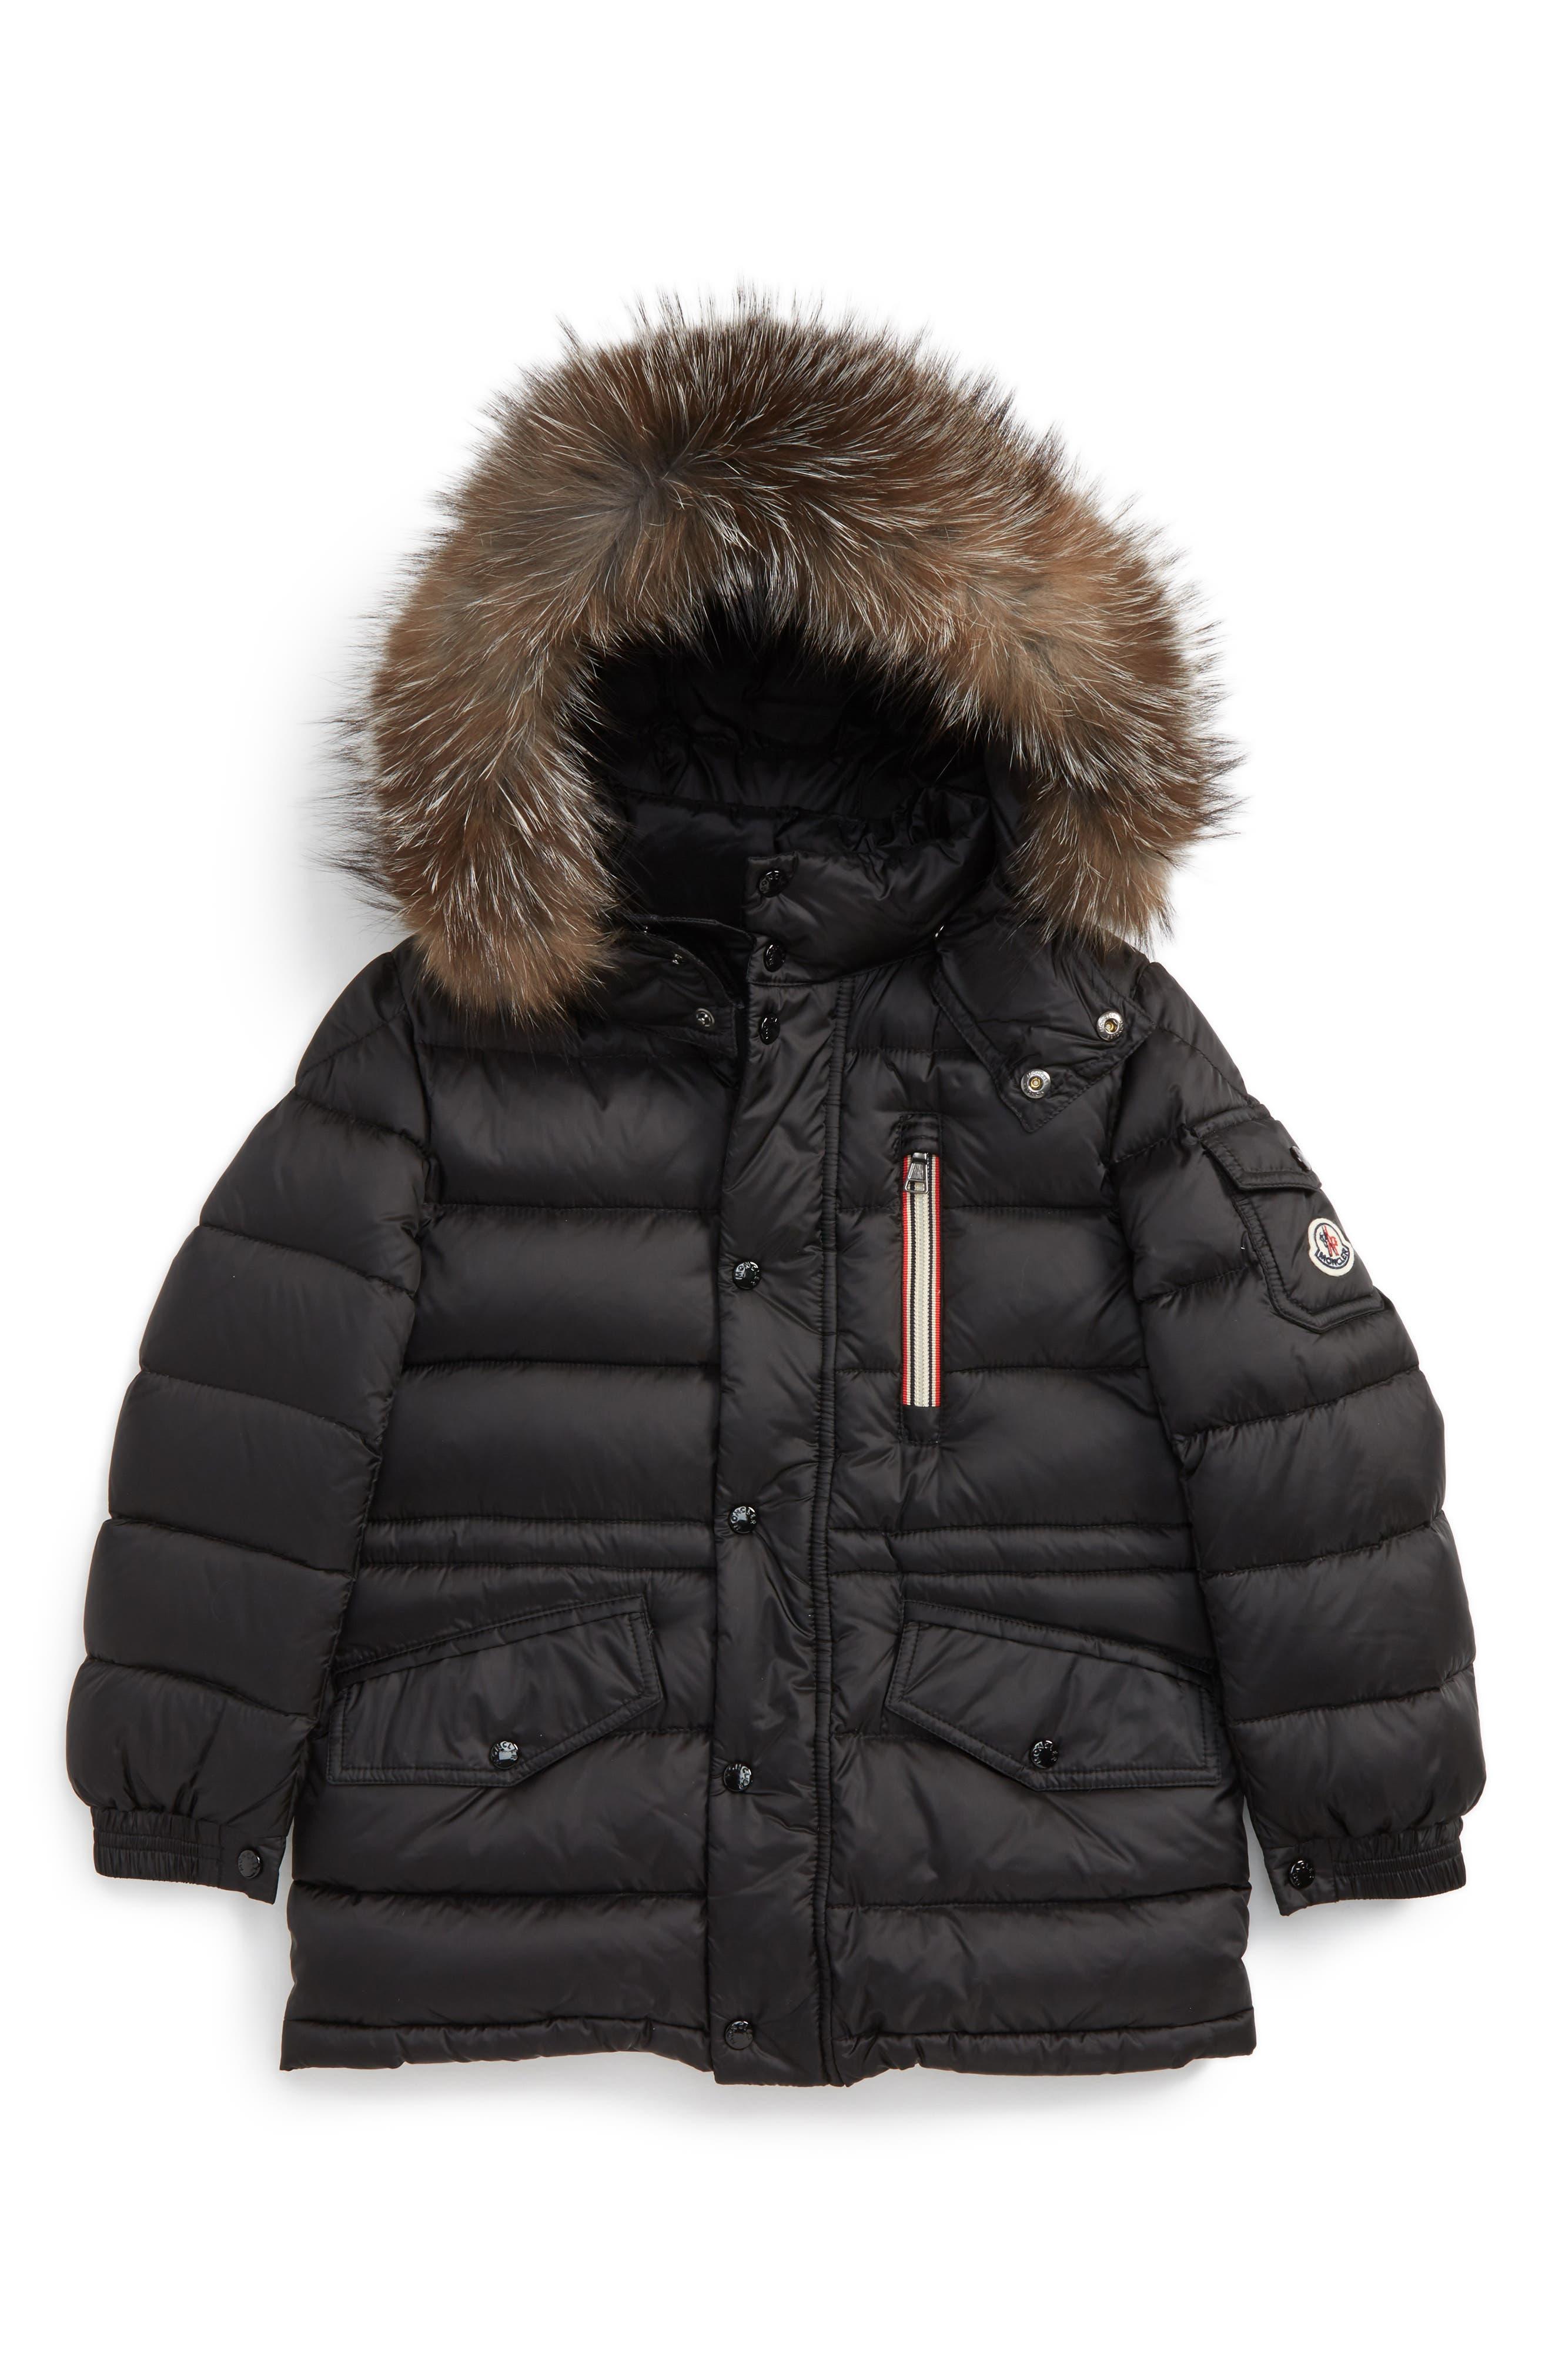 Moncler Lilian Water Resistant Down Parka with Genuine Fox Fur Trim (Little Girls & Big Girls)